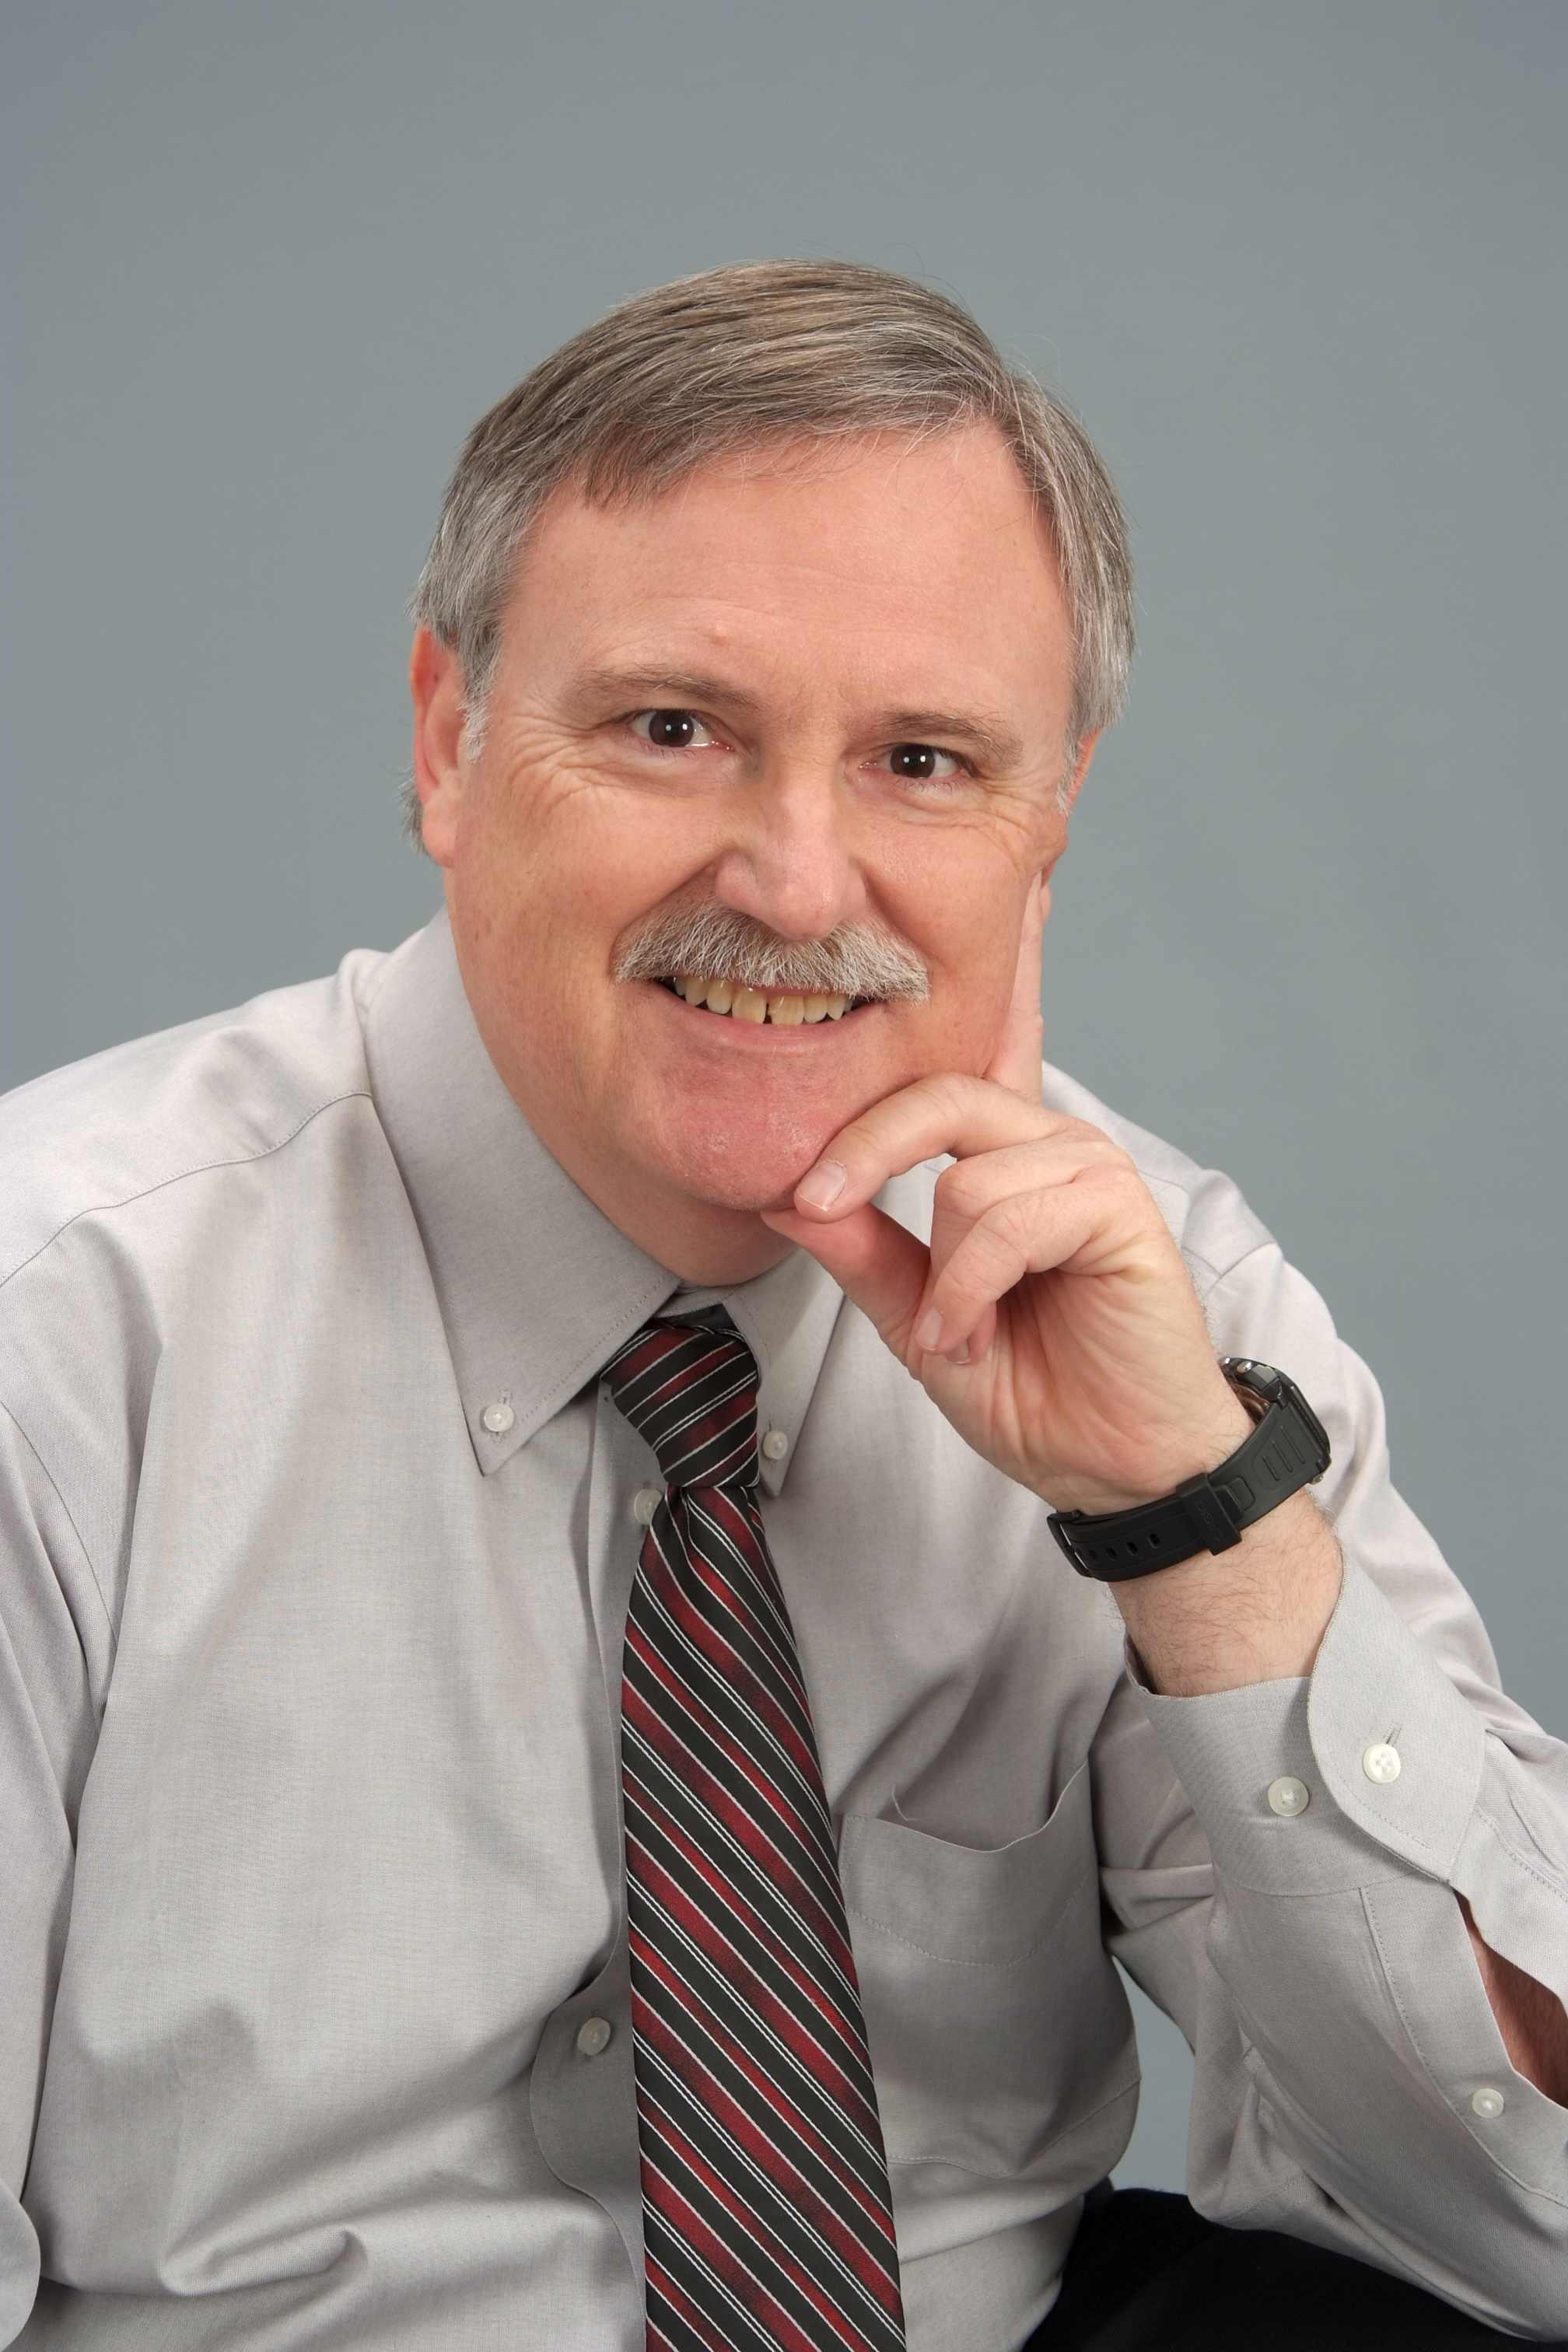 Dr. Keith Kent